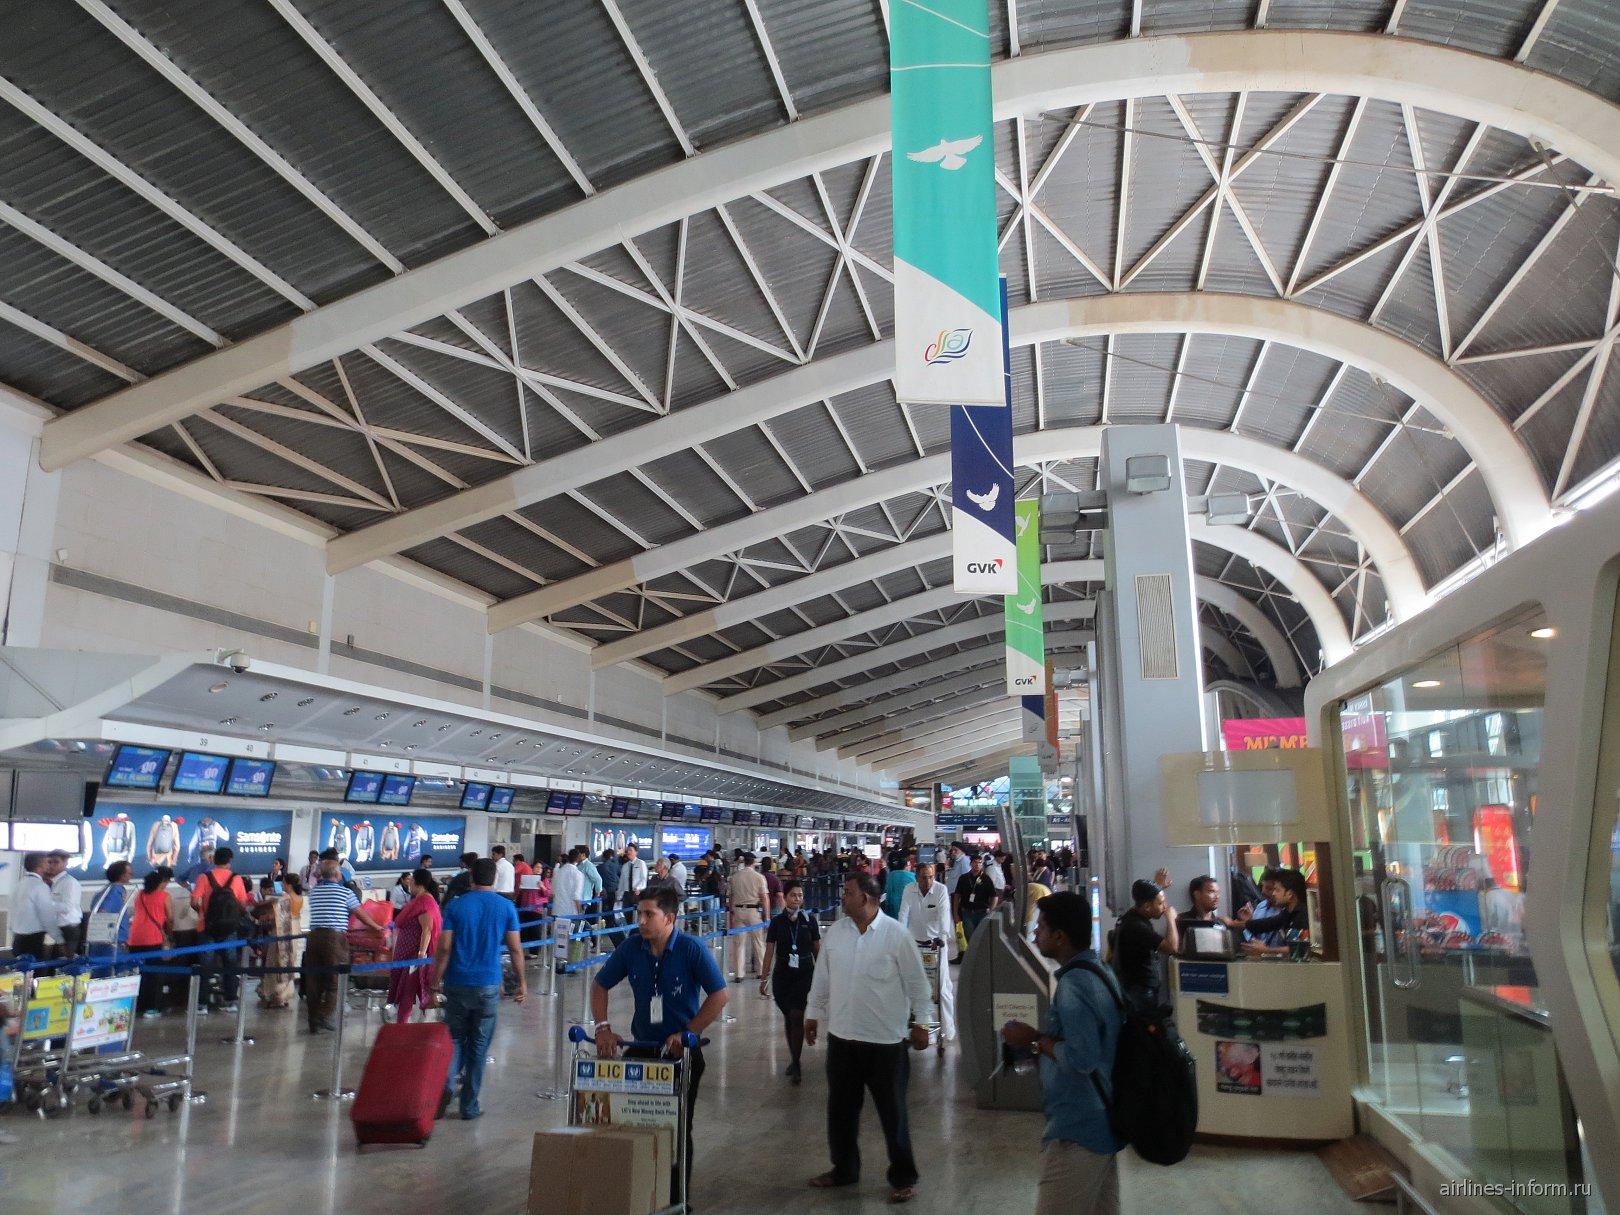 Зона регистрации на рейсы в аэропорту Мумбай Чатрапати Шиваджи